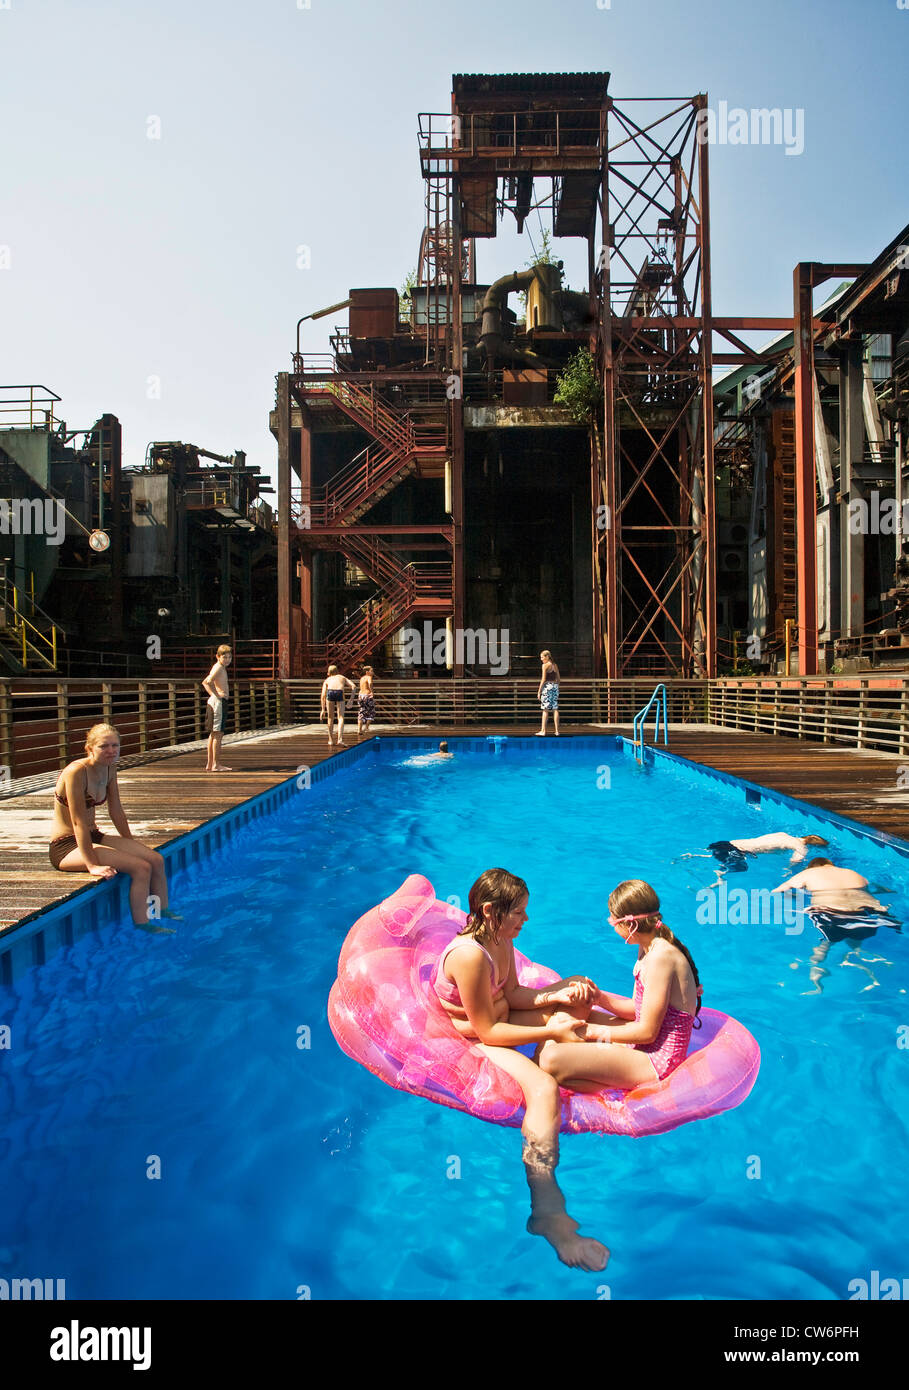 swimming pool at Kokerei Zollverein, Essen-Katernberg, Germany, North Rhine-Westphalia, Ruhr Area, Essen - Stock Image